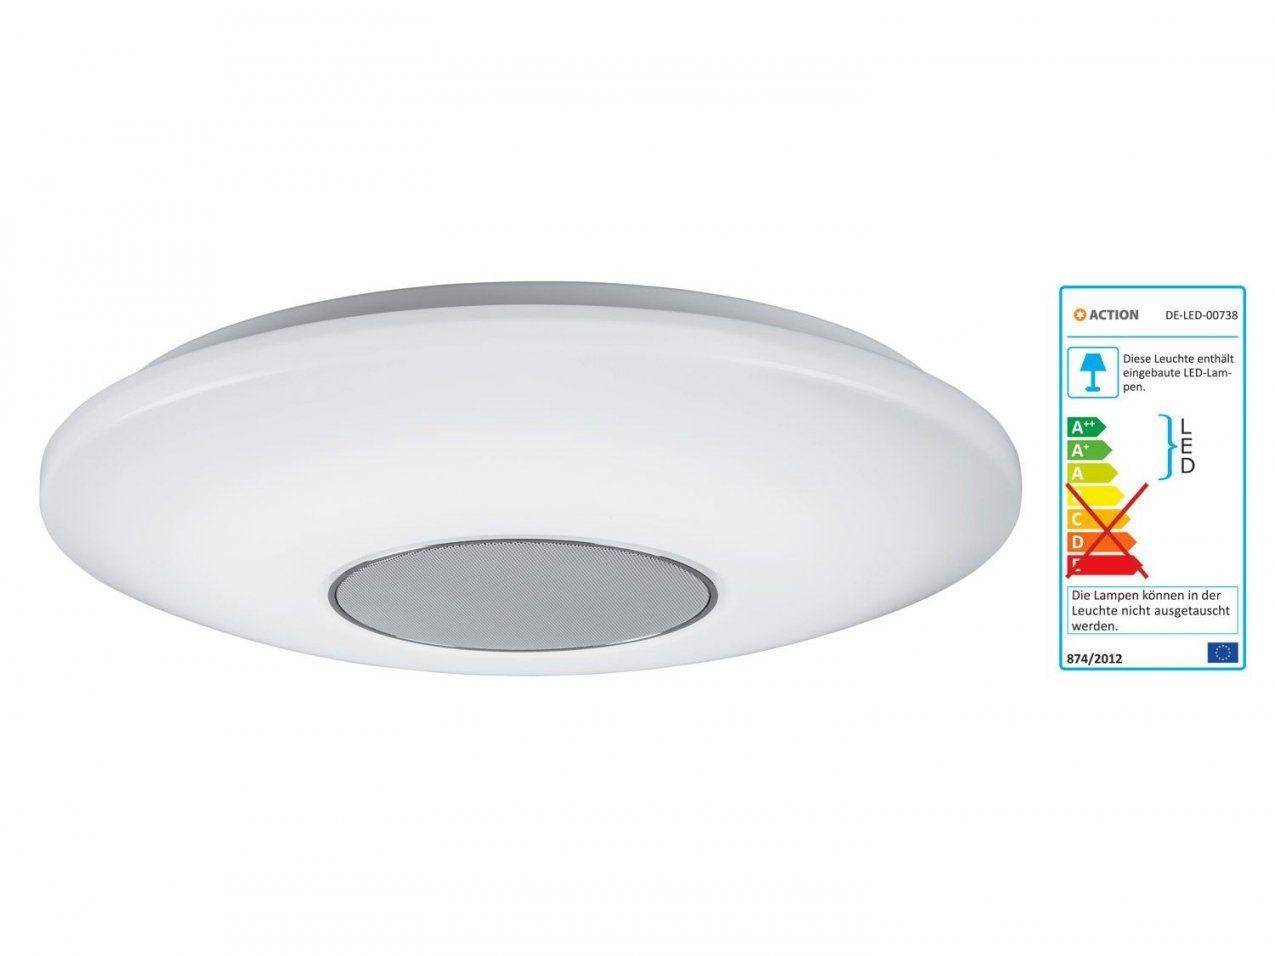 Deckenleuchte Sensor New Livarno Lux Led Deckenleuchte Mit Bluetooth von Livarno Lux Led Wand Deckenleuchte Bild